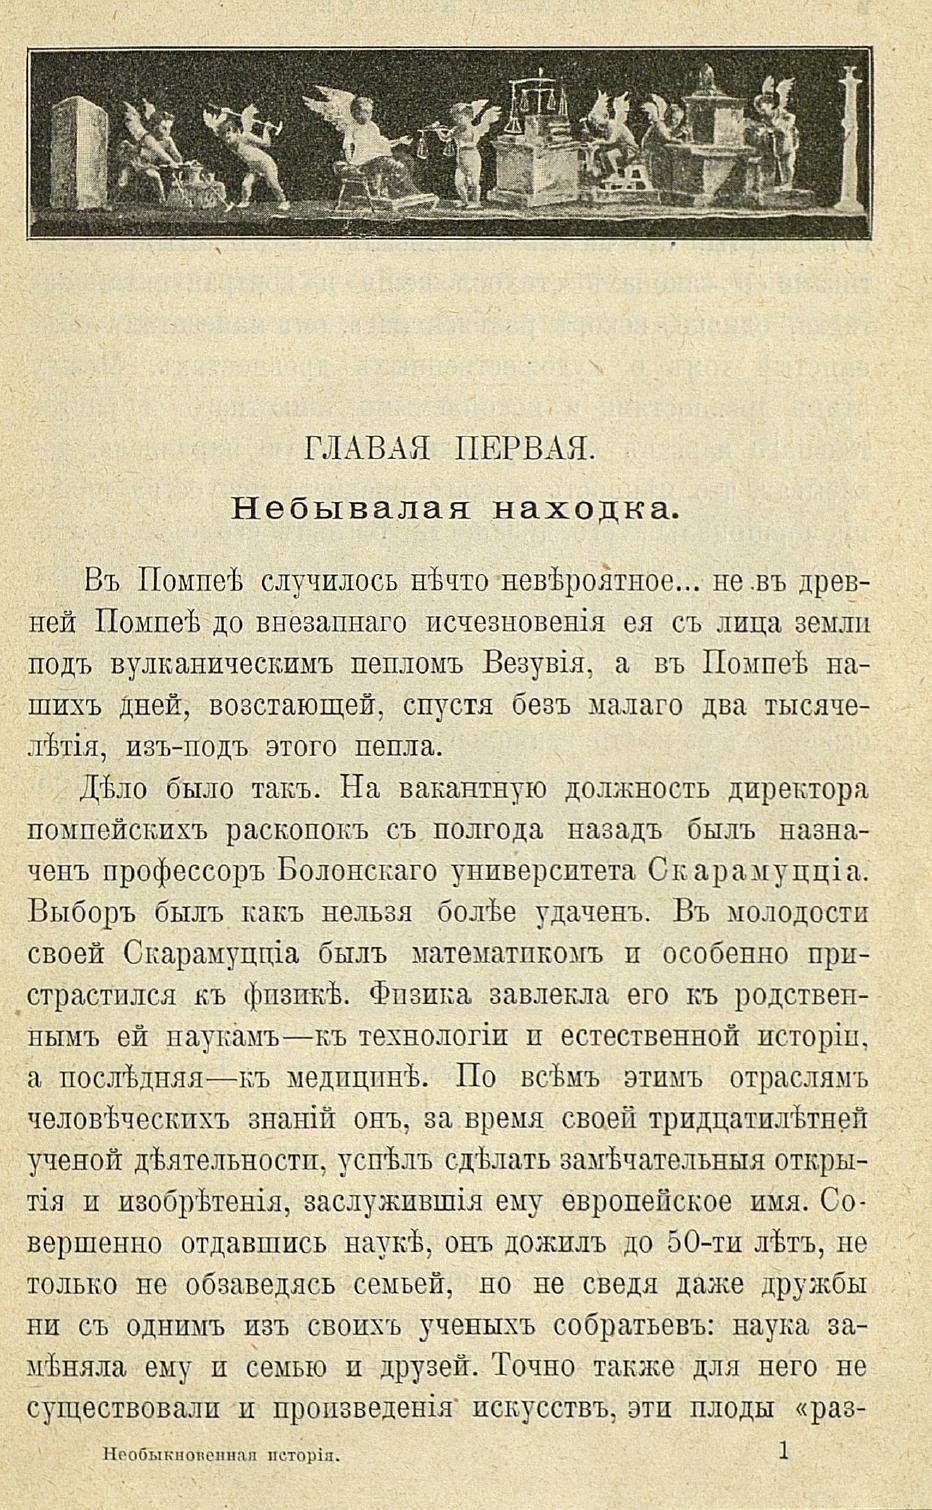 http://images.vfl.ru/ii/1407084874/47d06fb9/5887468.jpg